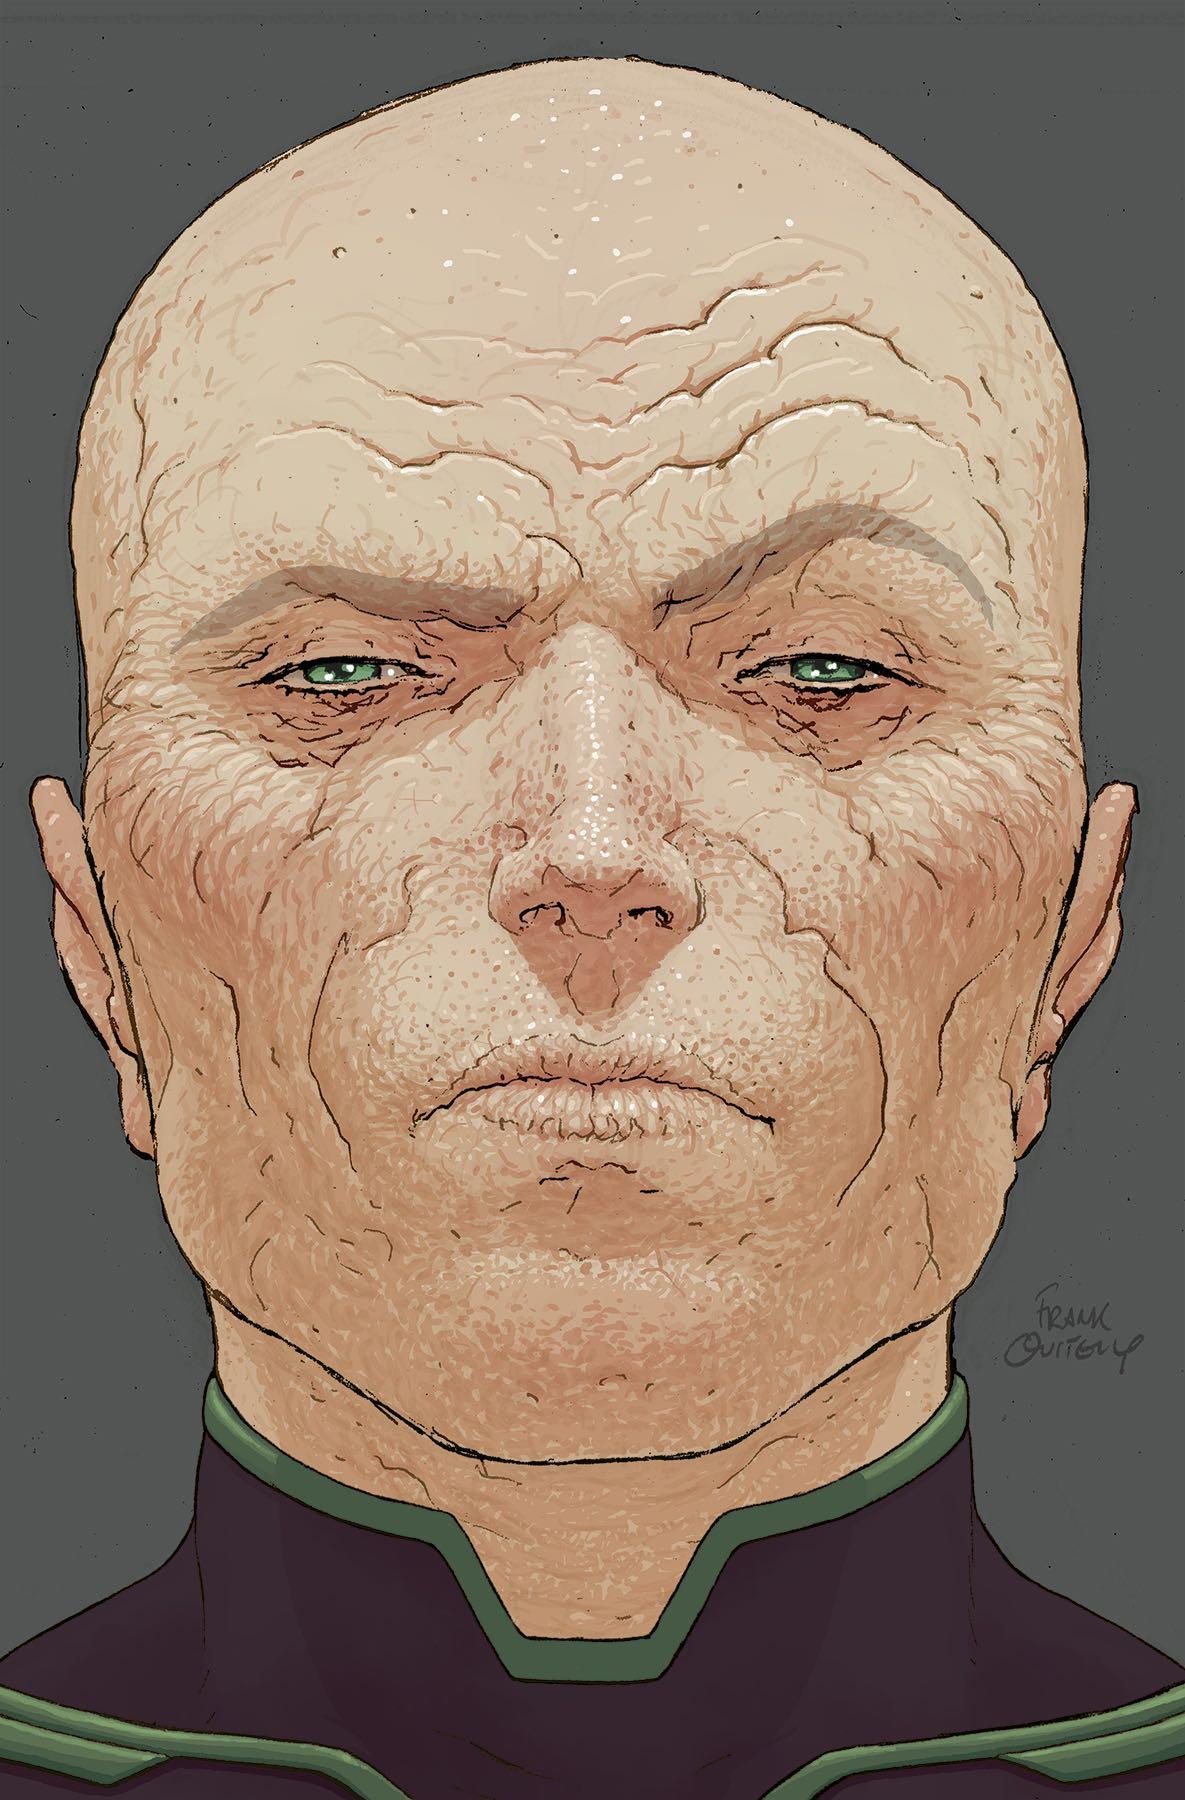 Action Comics Vol 1 1013 Textless Variant.jpg